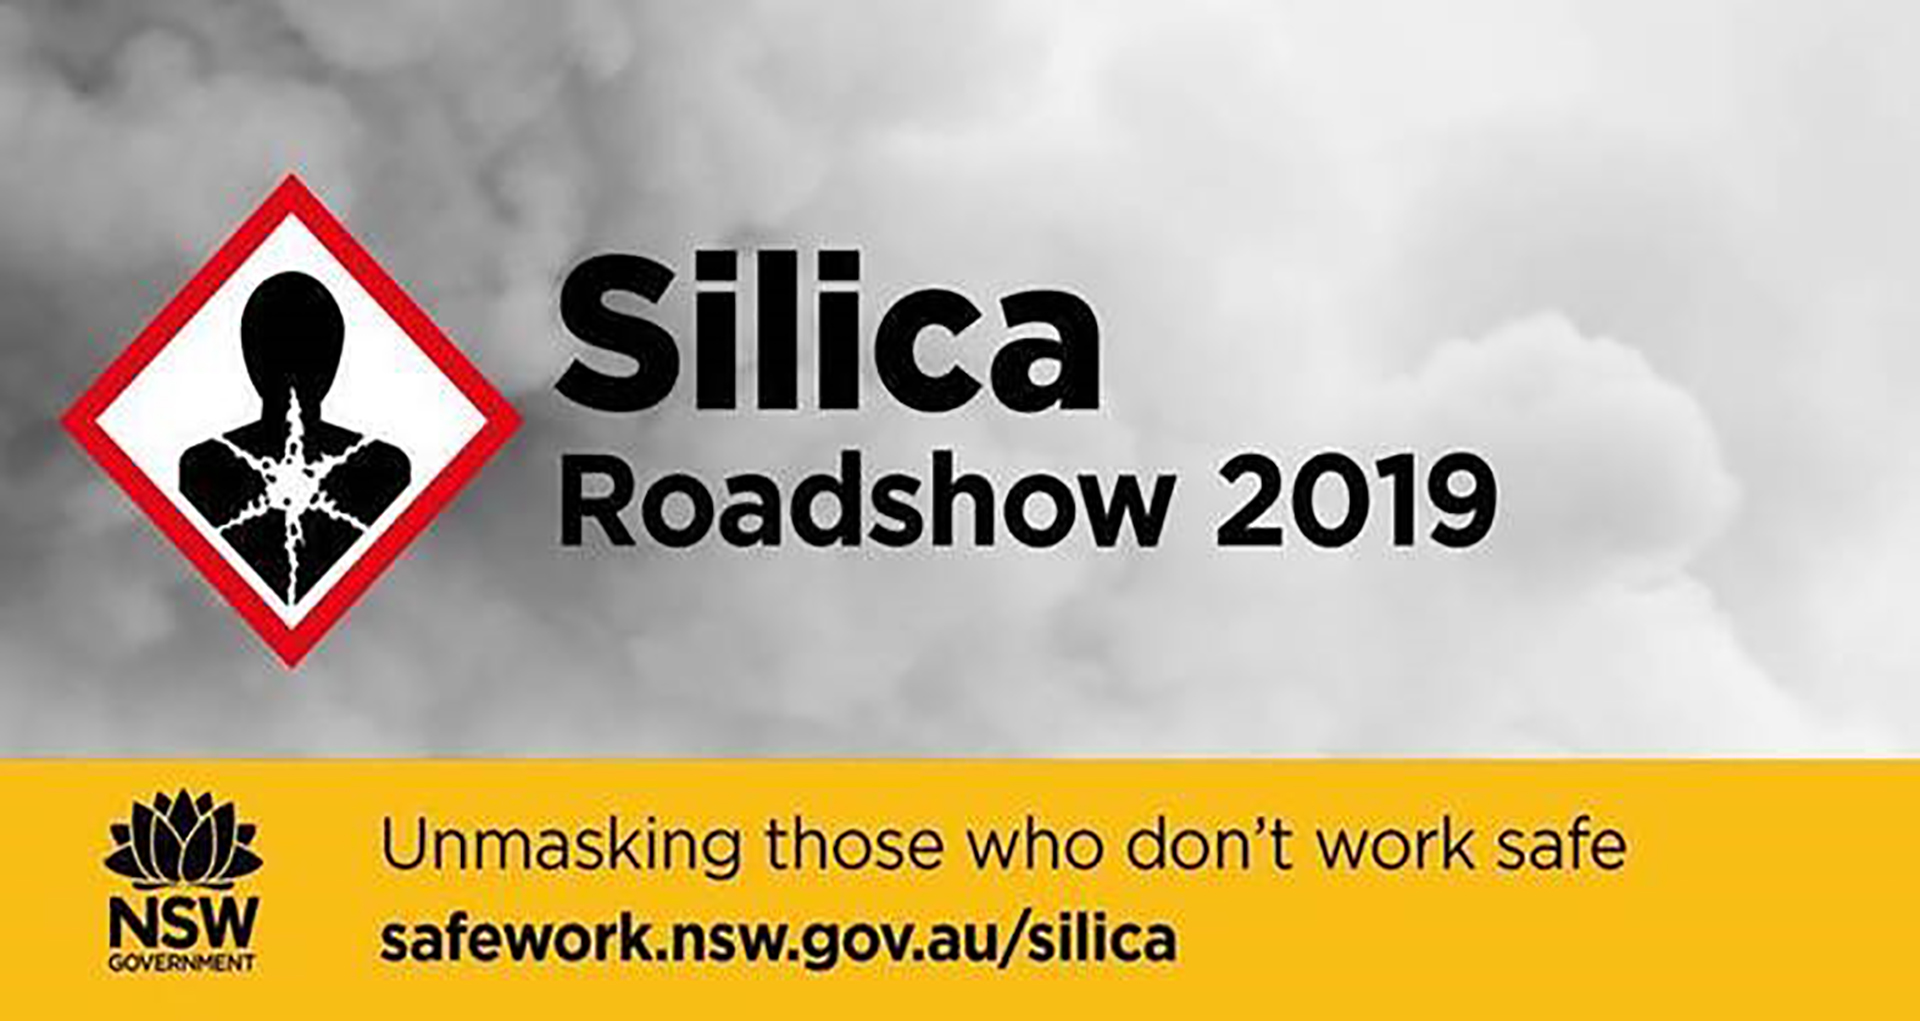 silica roadhsow - resized